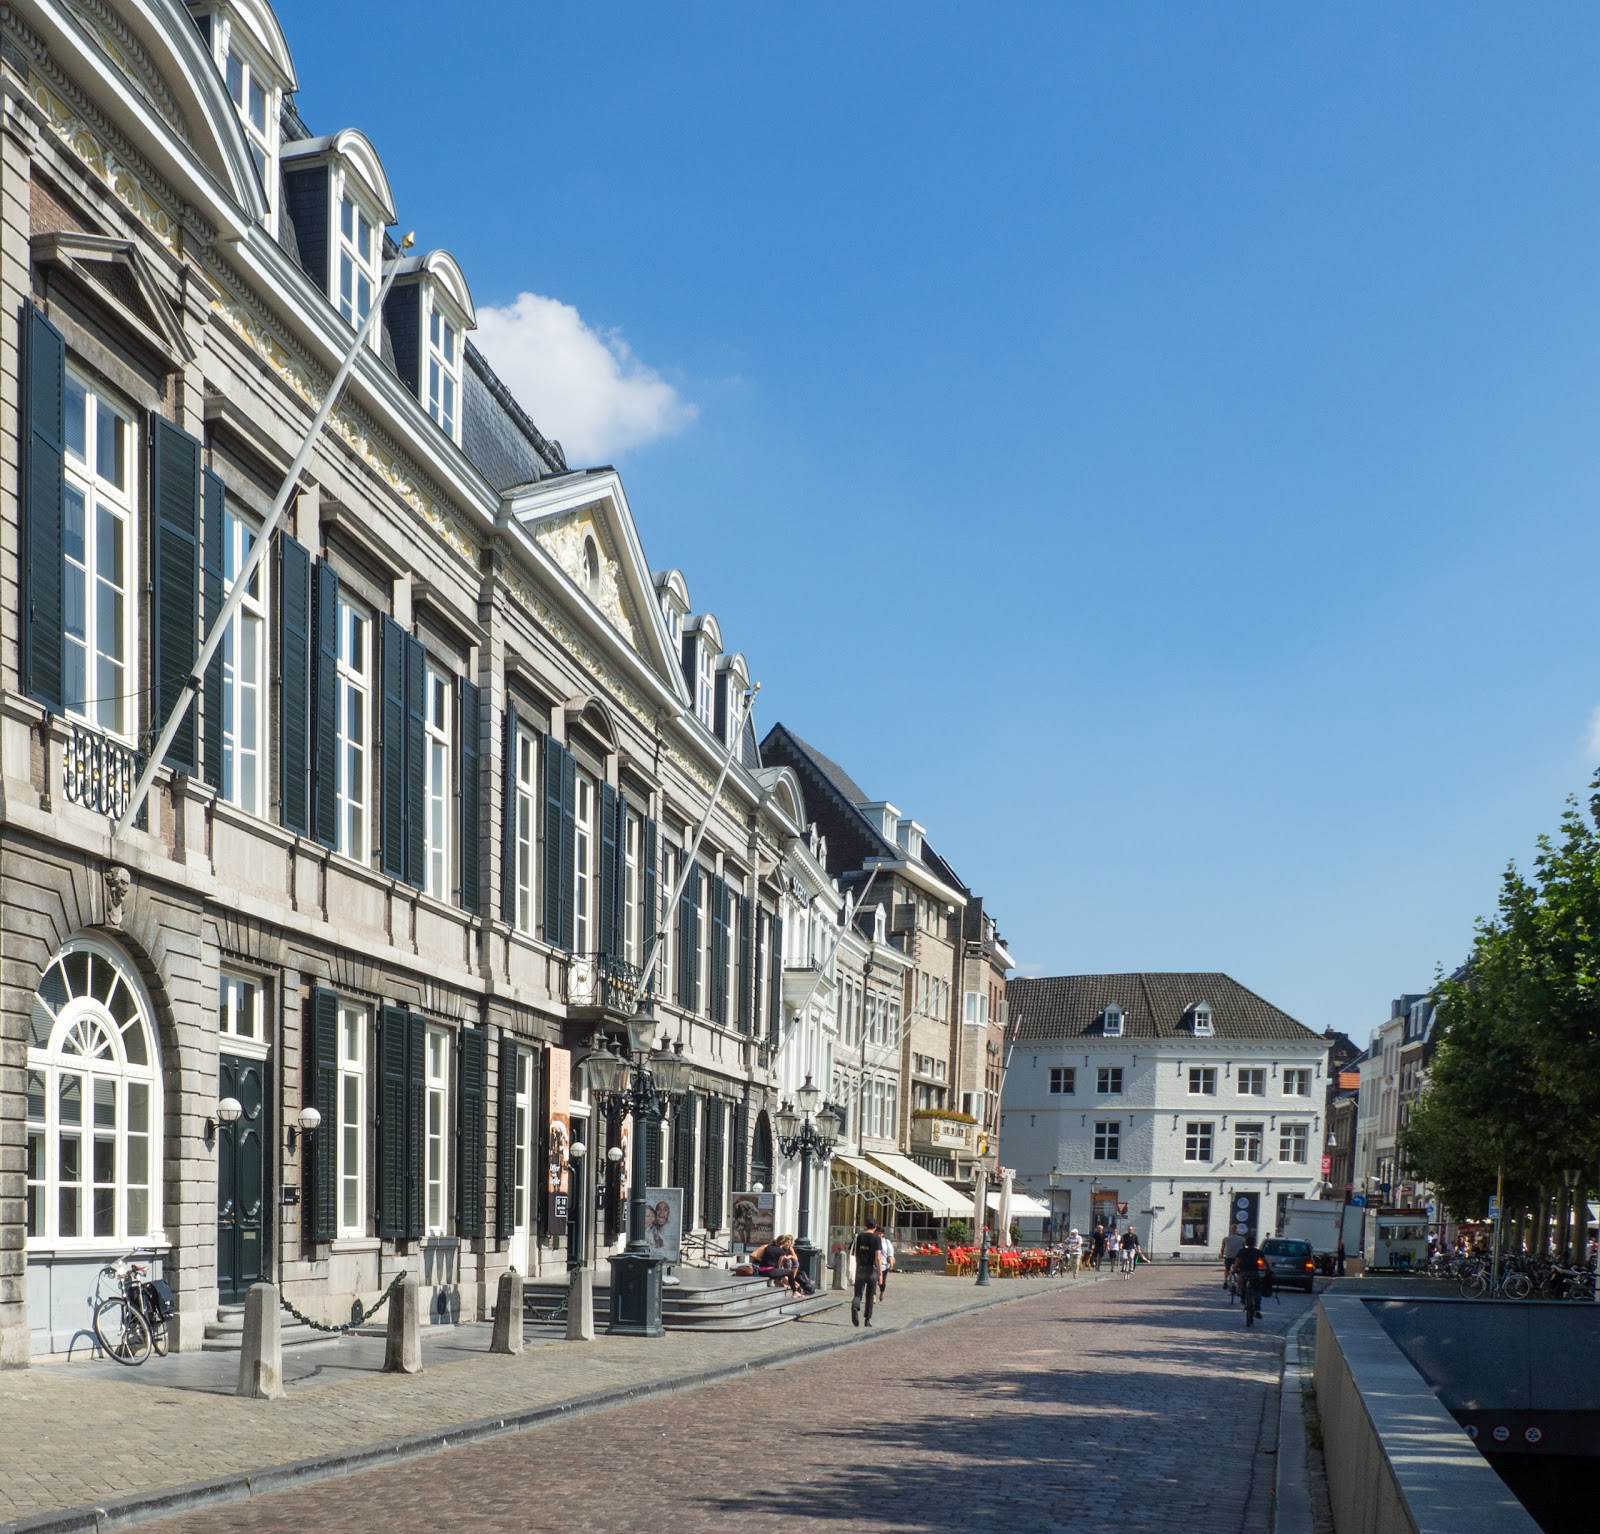 Theater Aan 't Vrijthof Nederland accepteert American Express Credit Cards